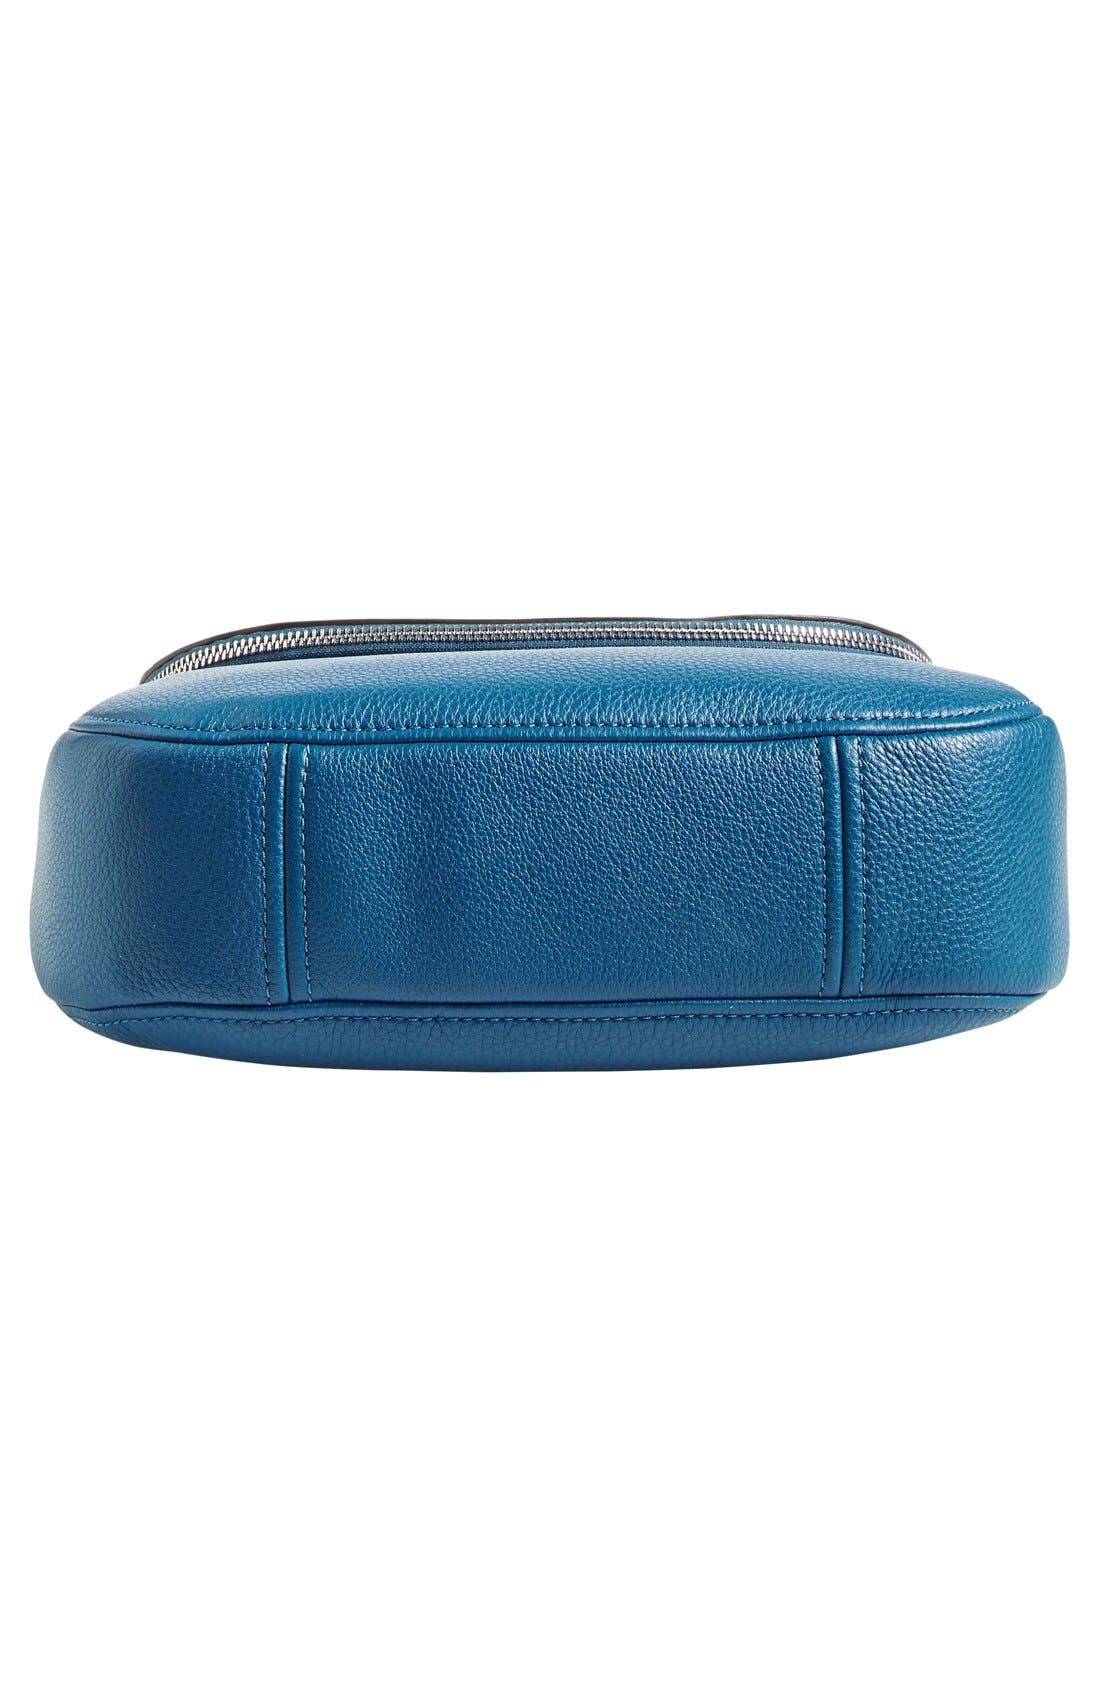 Alternate Image 5  - MICHAEL Michael Kors 'Bedford Tassel - Medium' Shoulder Bag (Nordstrom Exclusive)